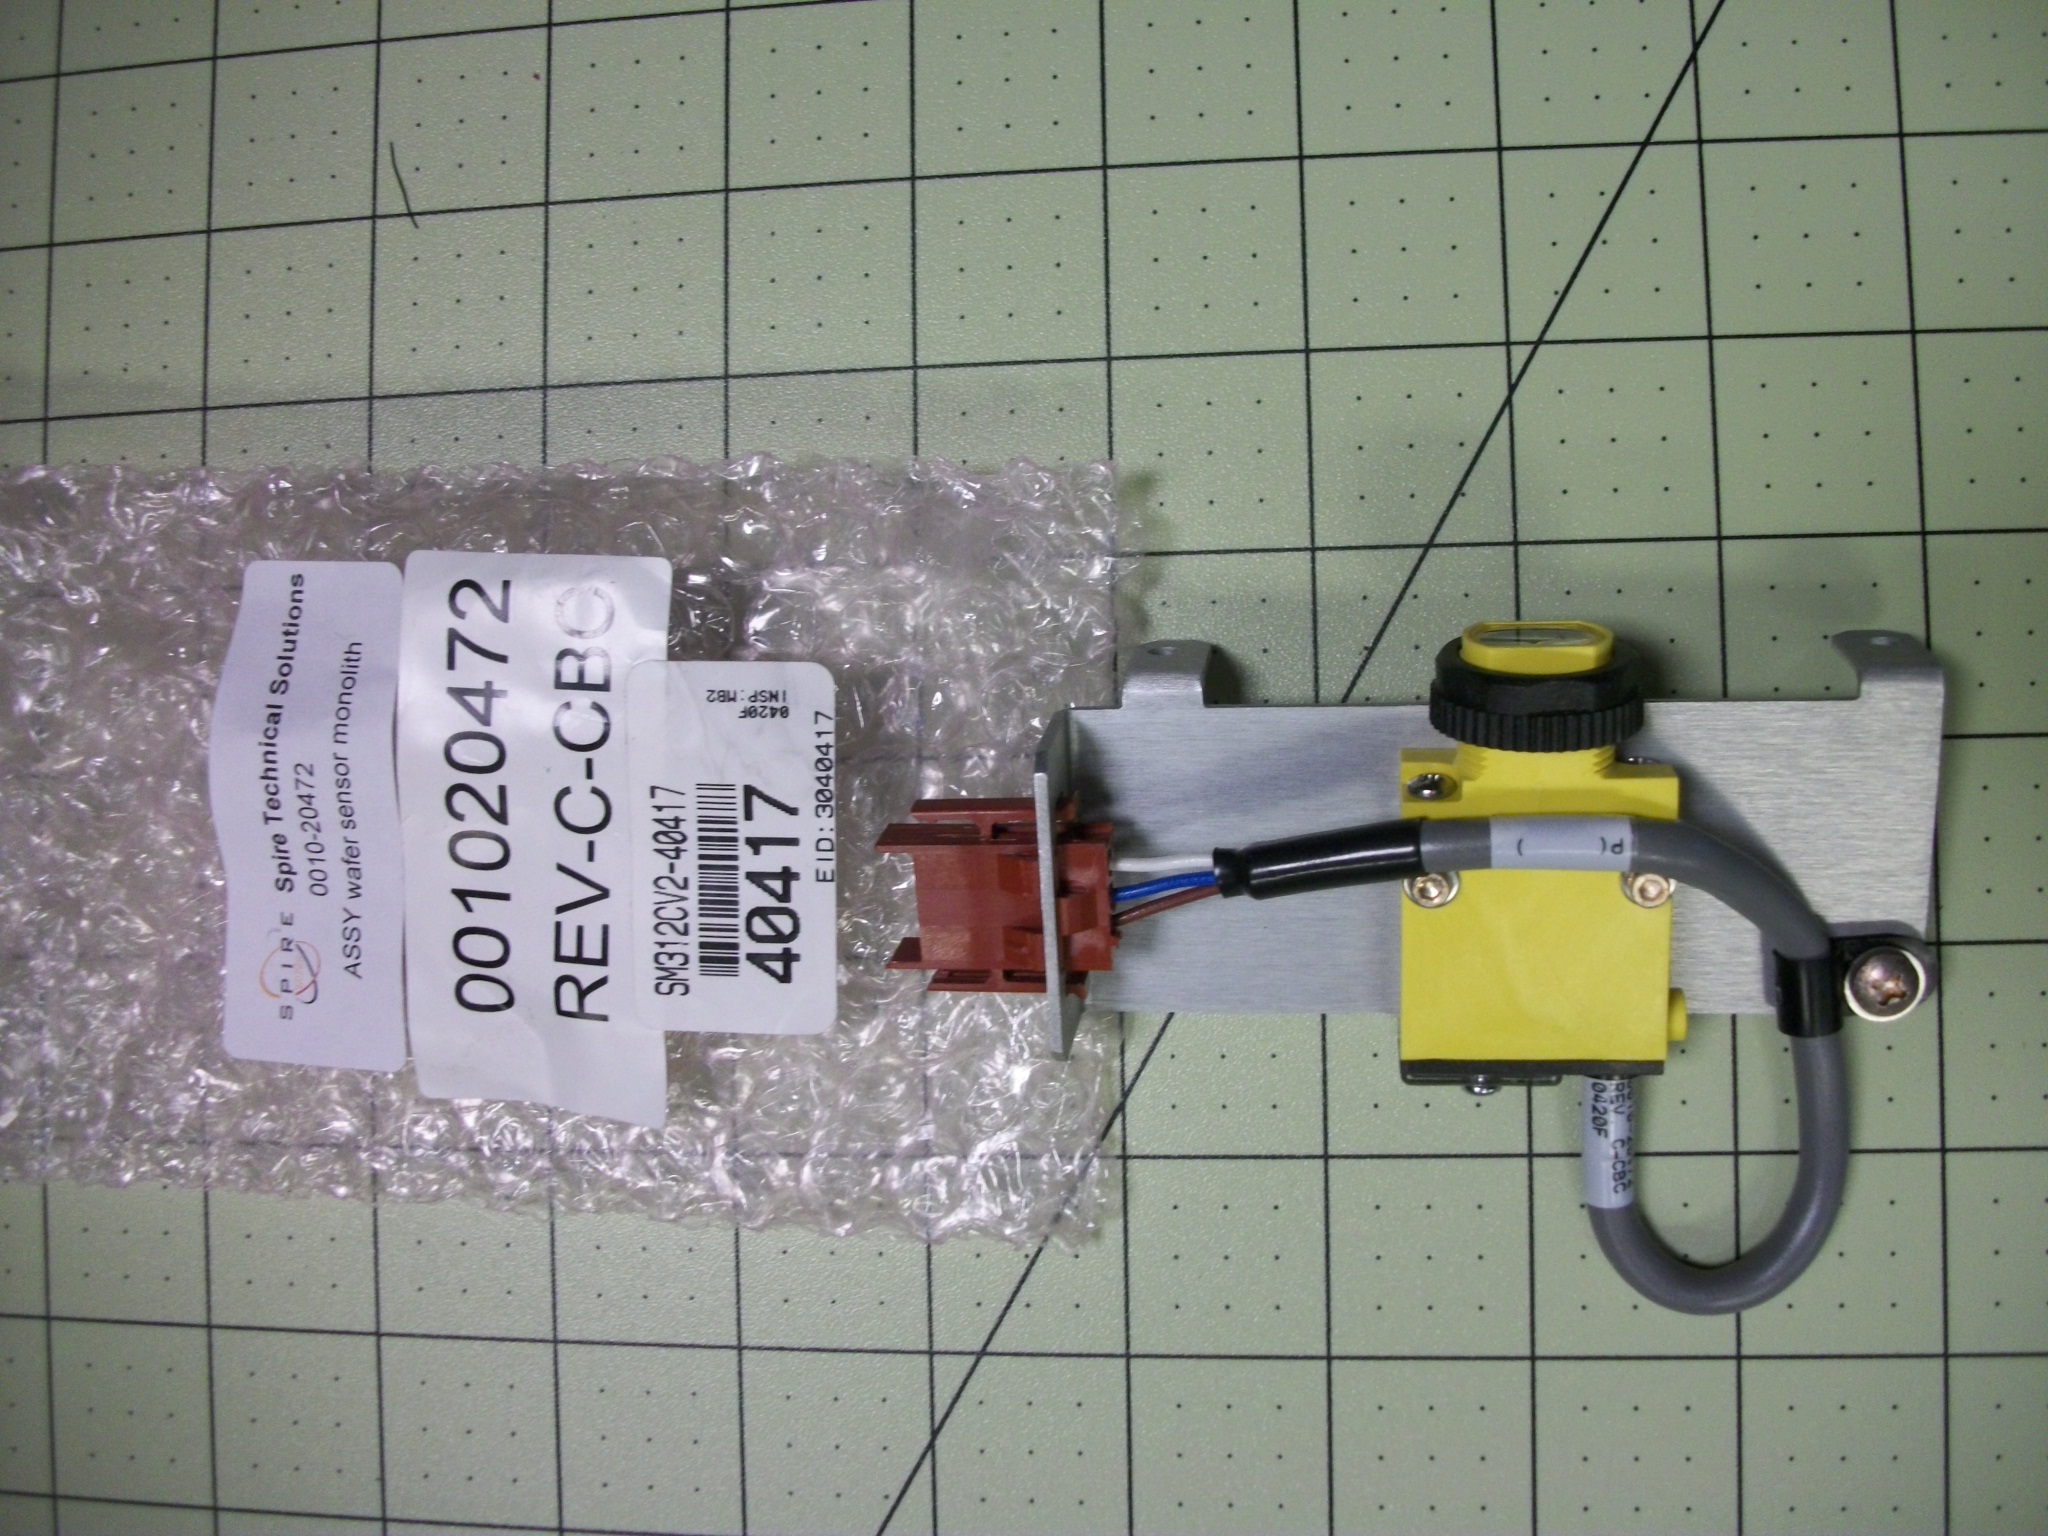 Assembly Wafer Sensor Monolith